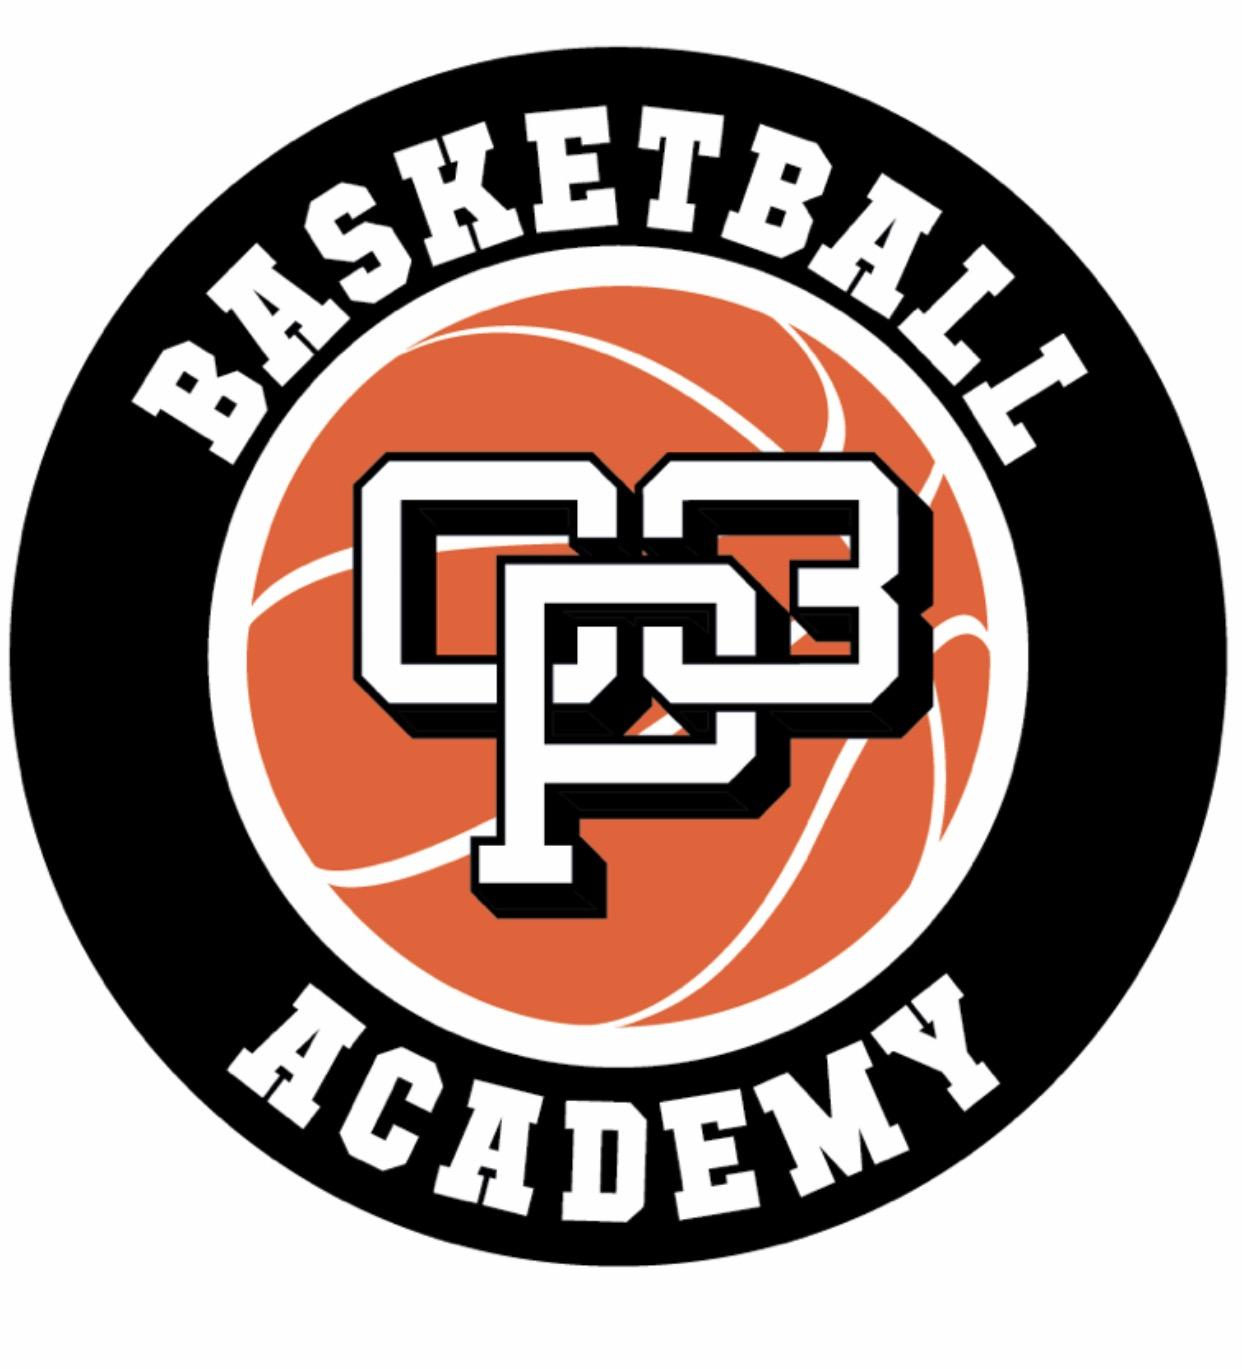 CP3 Basketball Academy Open House NBA Draft Night